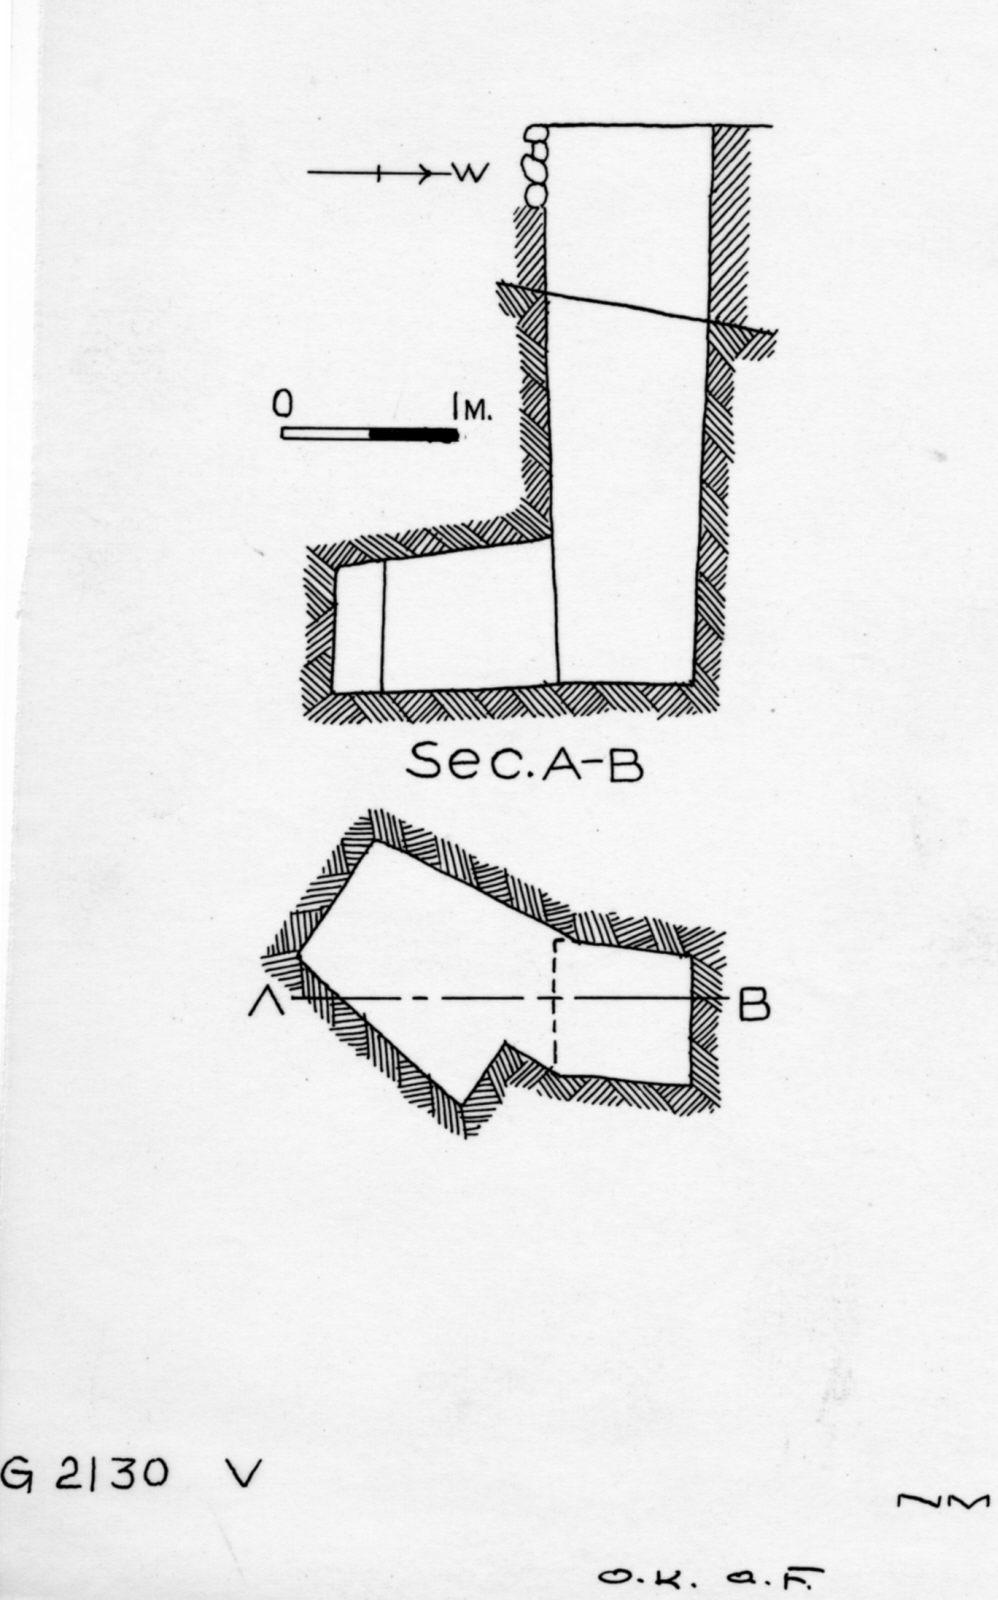 Maps and plans: G 2130, Shaft V